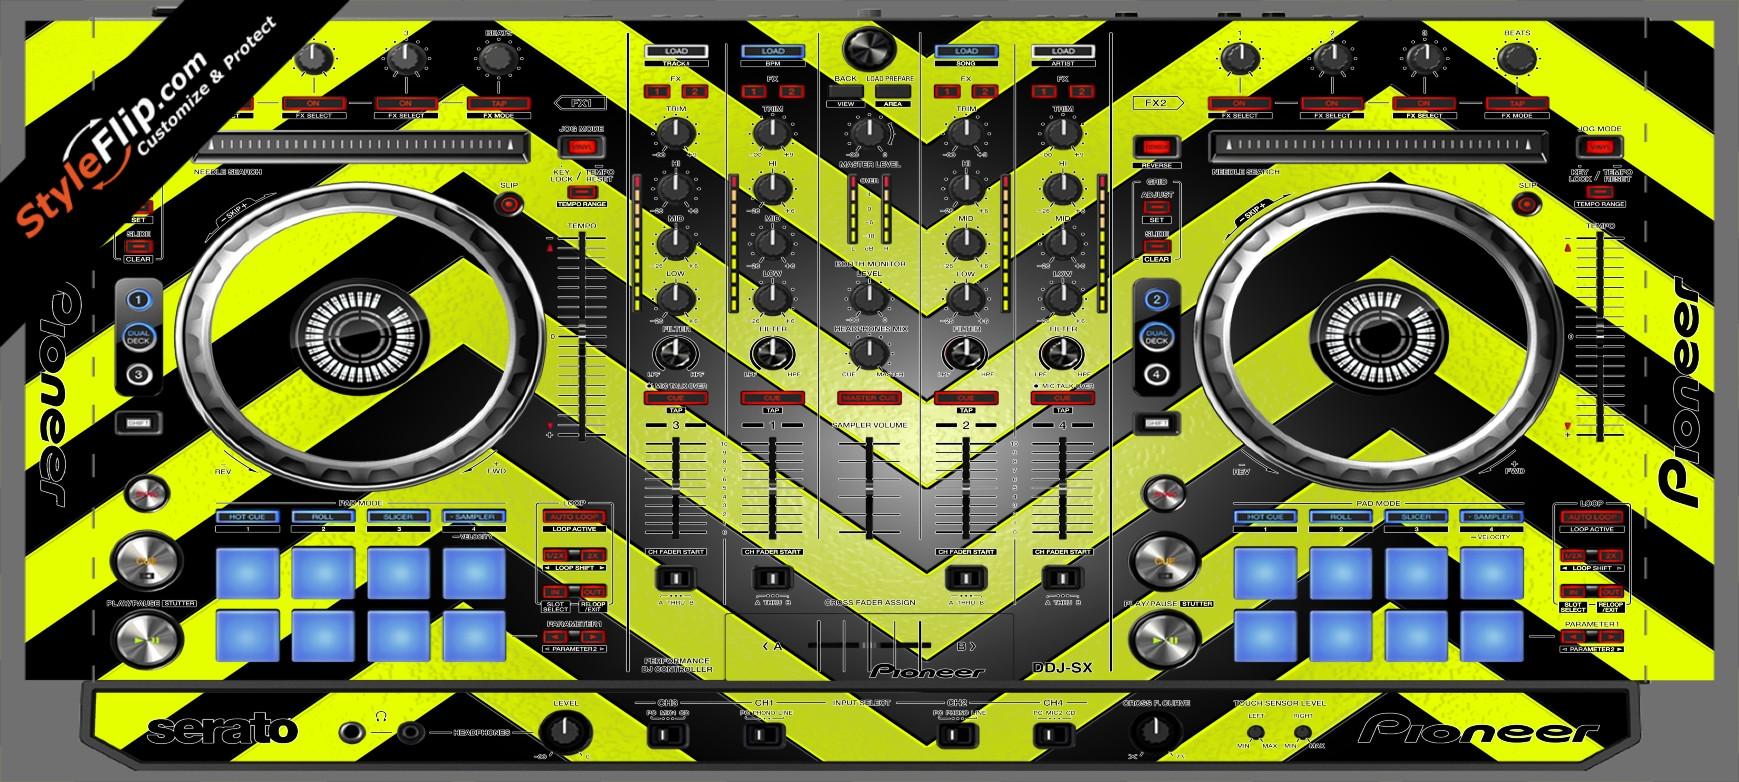 Black & Yellow Chevron Pioneer DDJ-SX